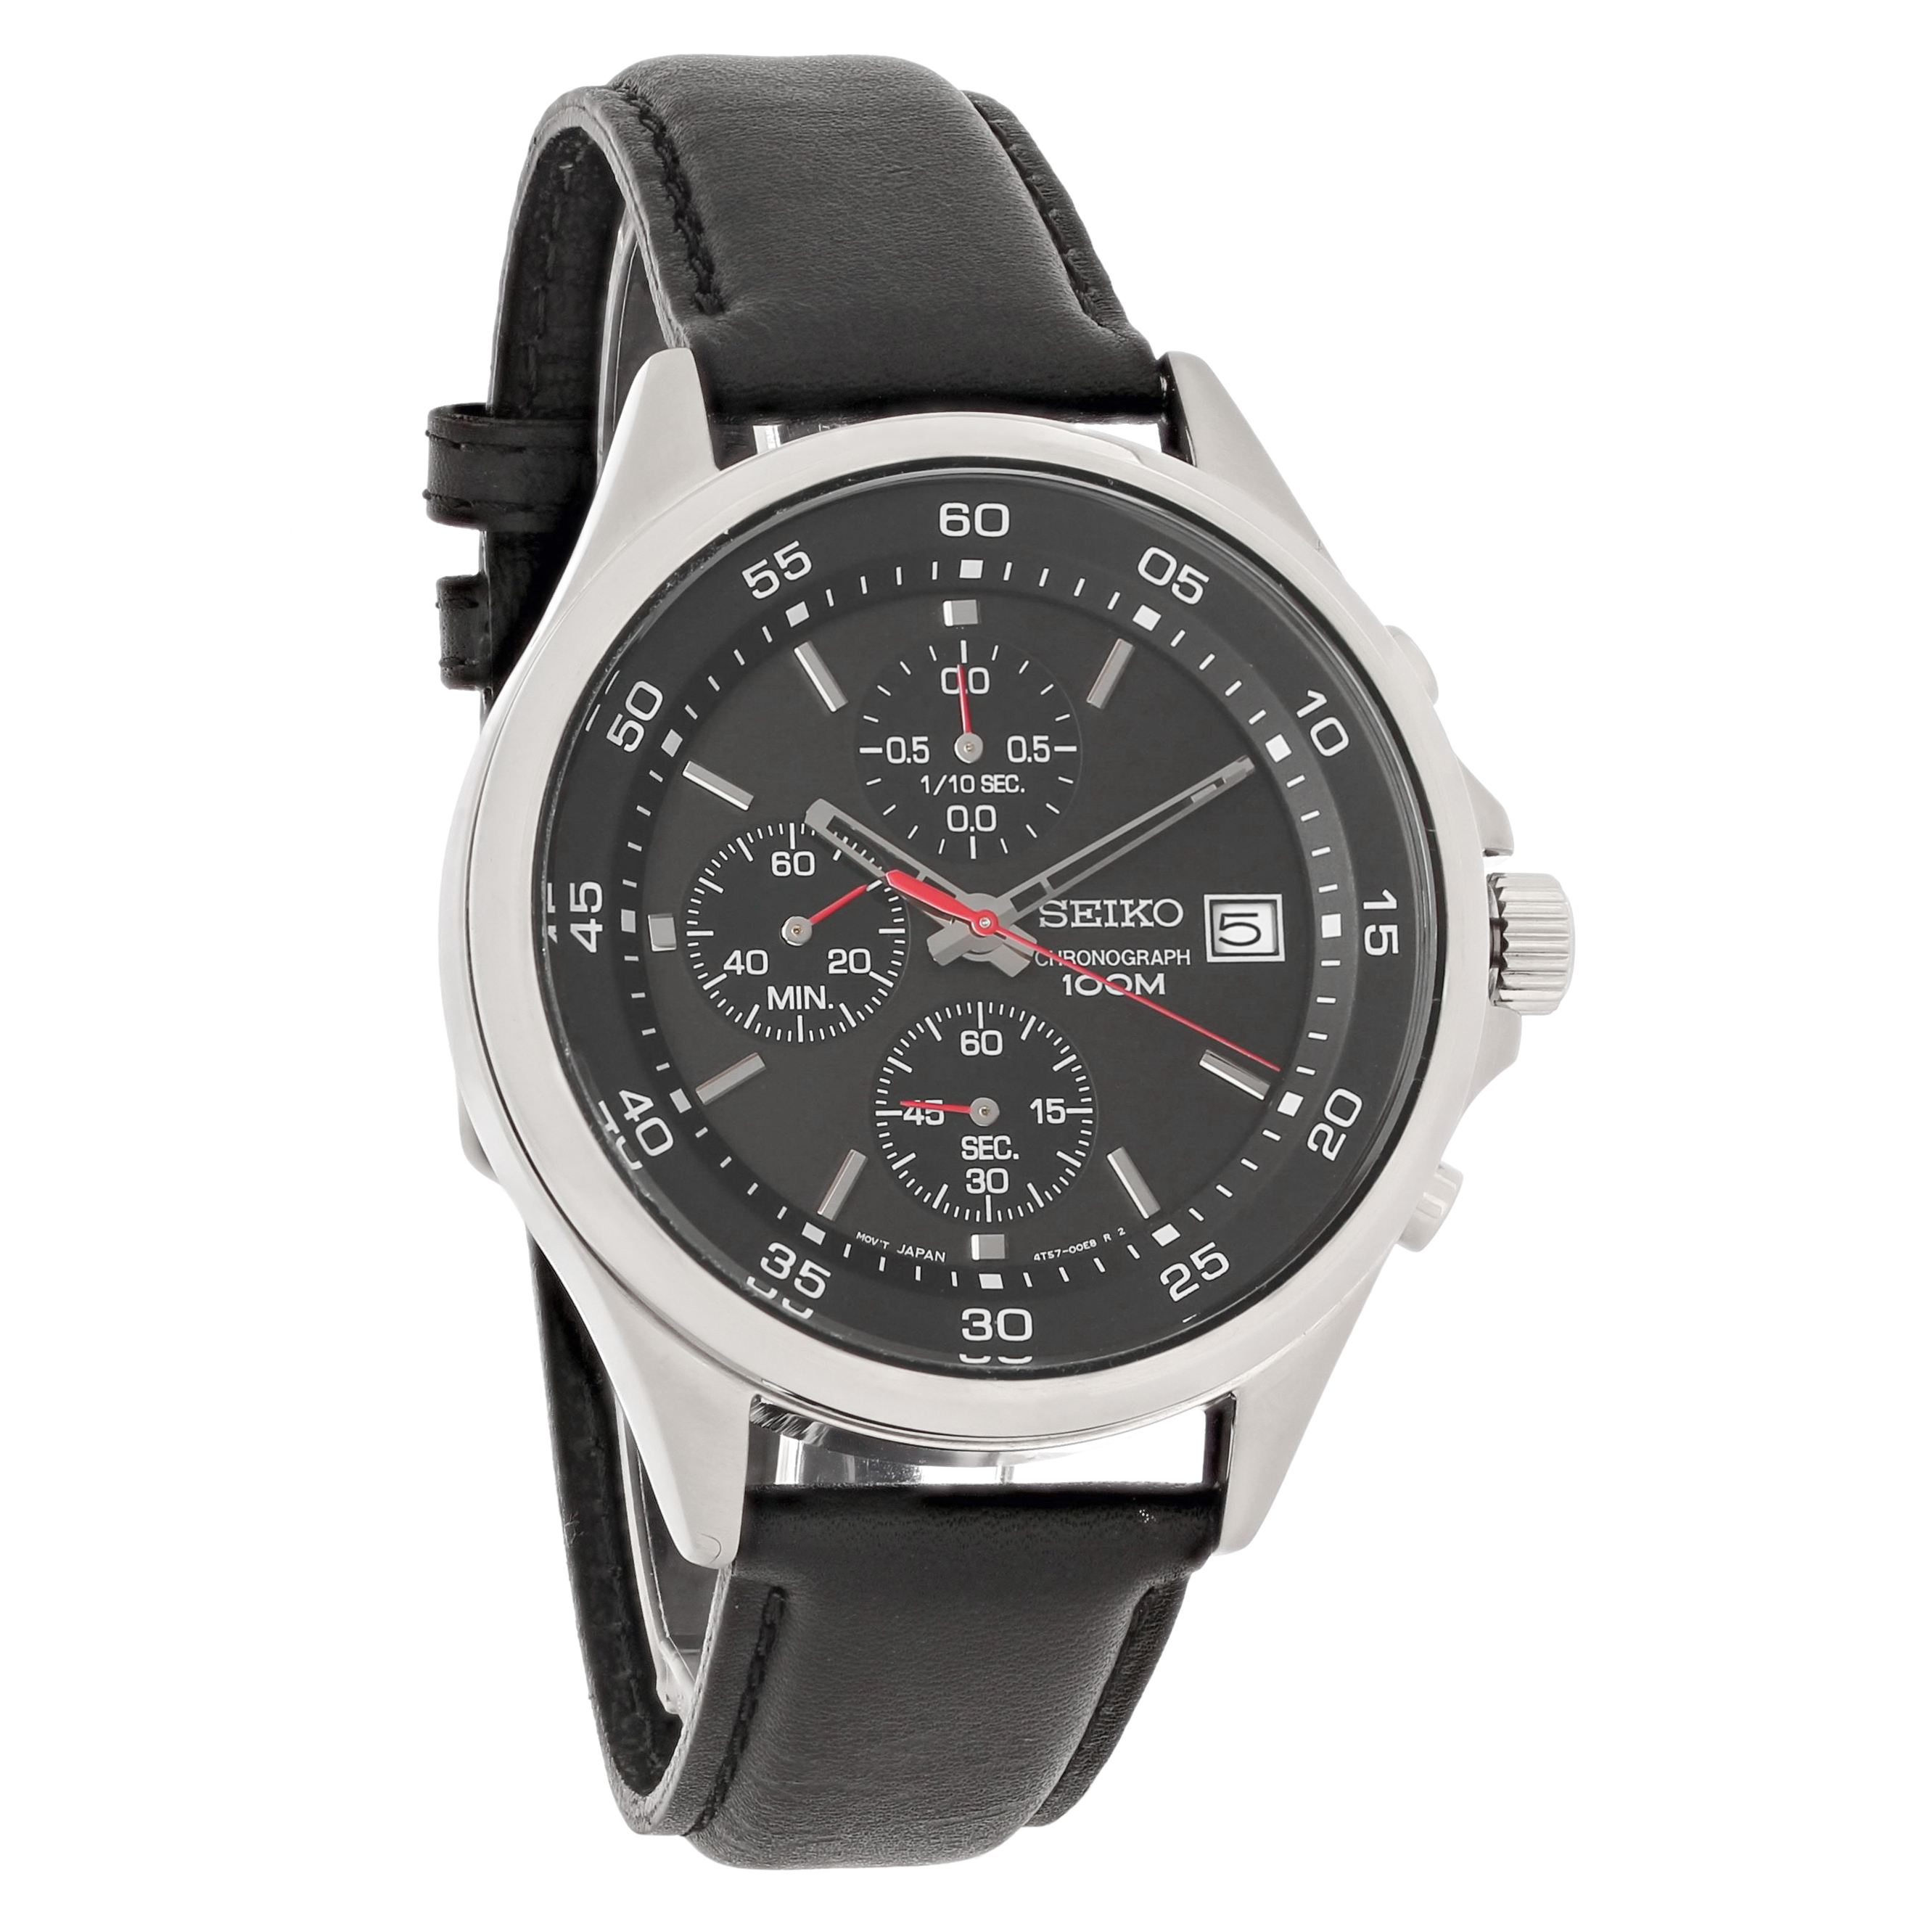 Seiko mens black dial leather strap chronograph quartz watch sks495 ebay for Black leather strap men